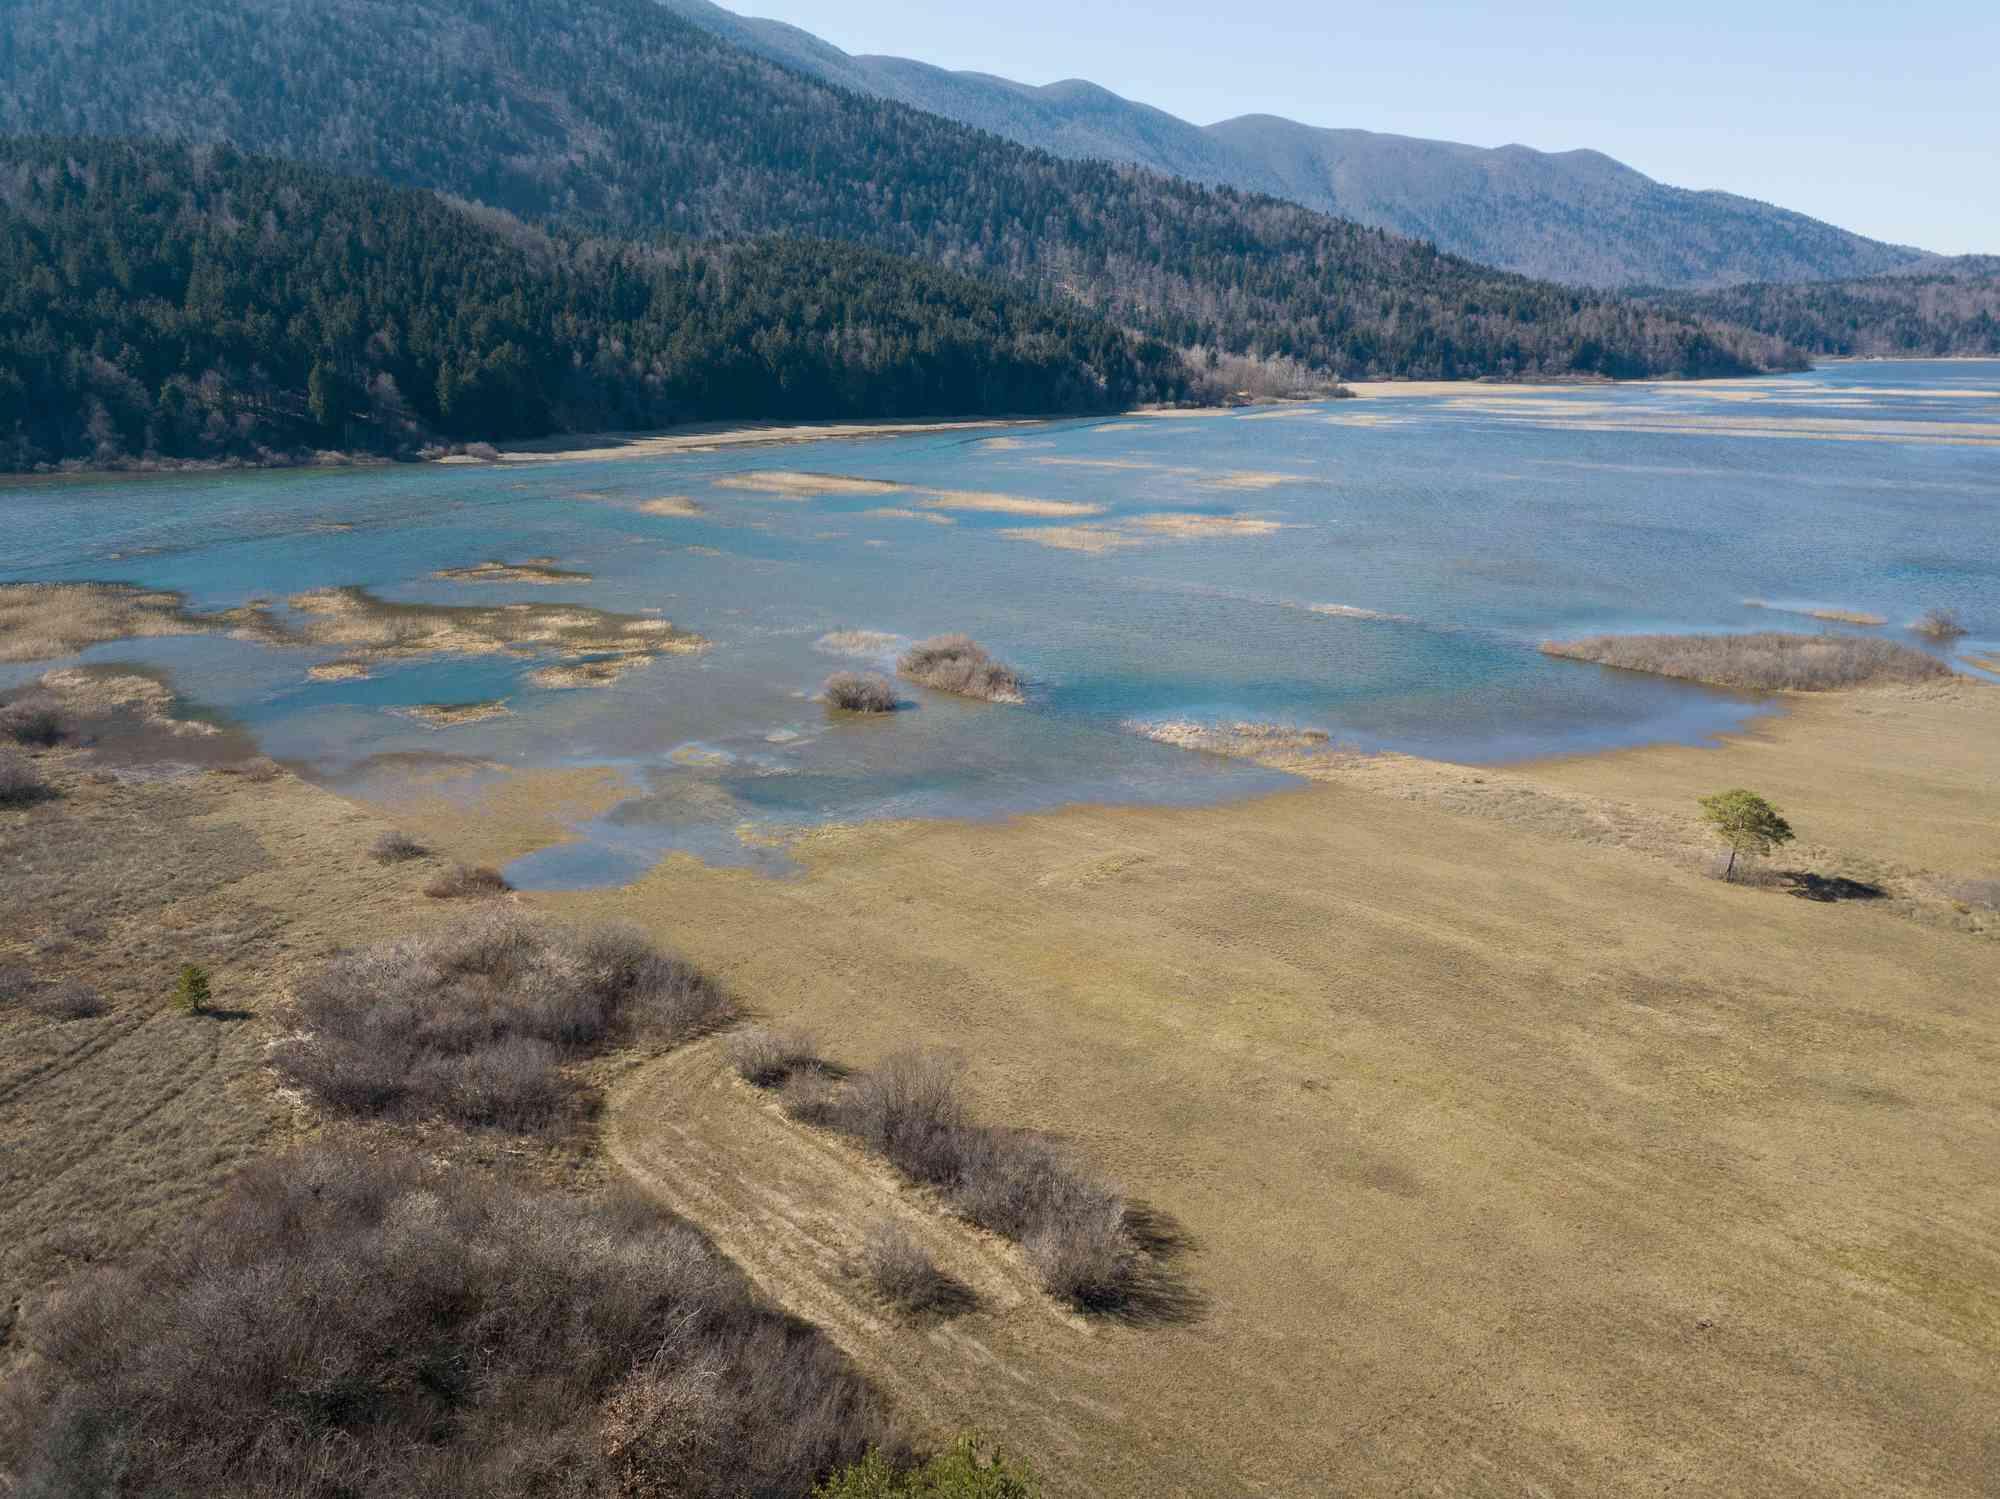 A receding lake reveals grasslands beneath the water